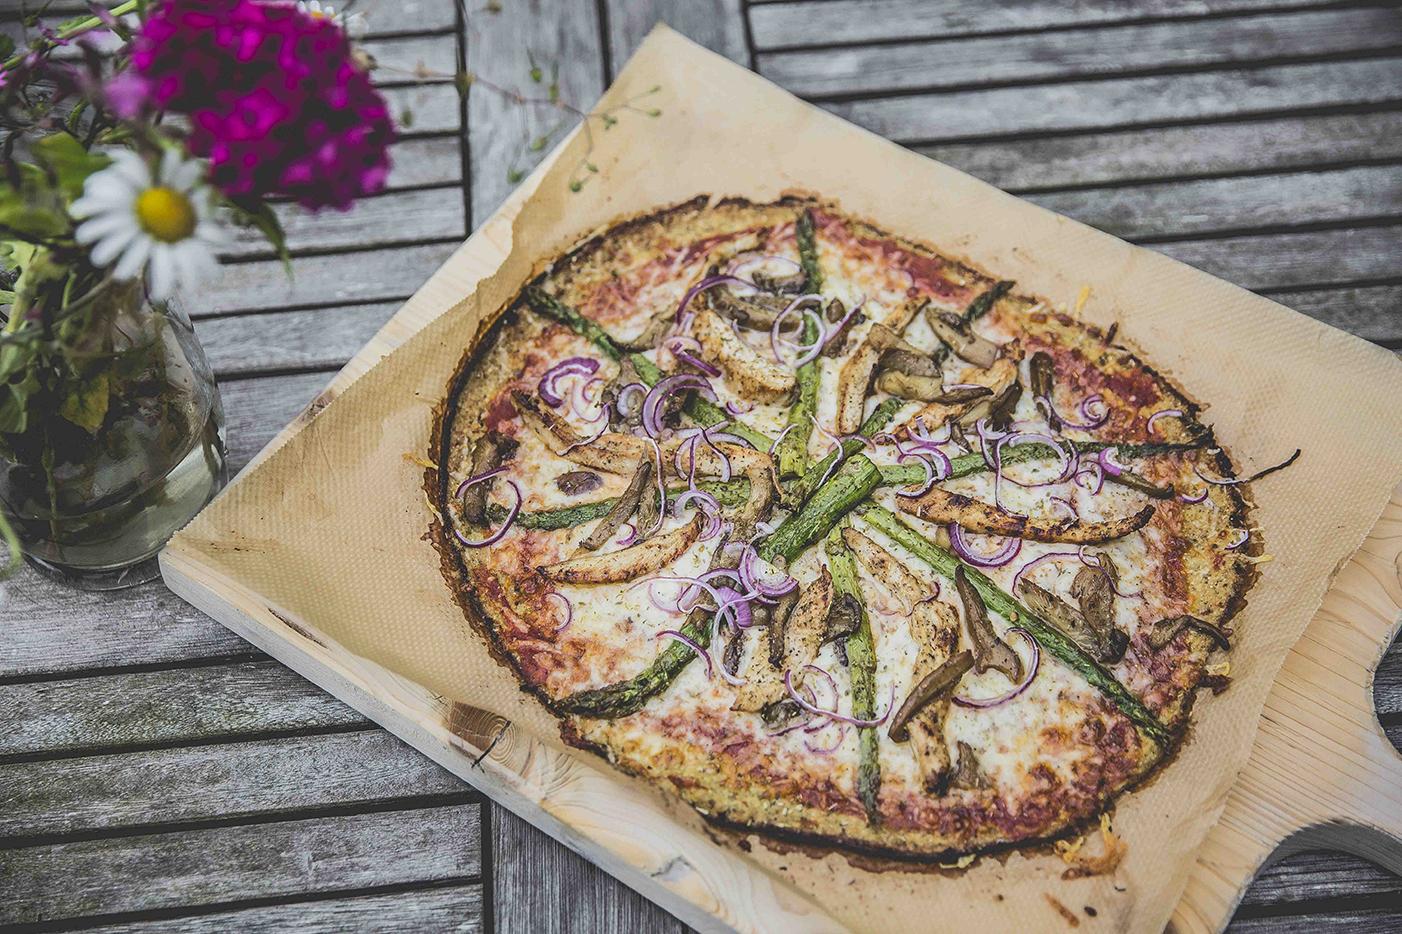 Bloemkool/broccoli pizza